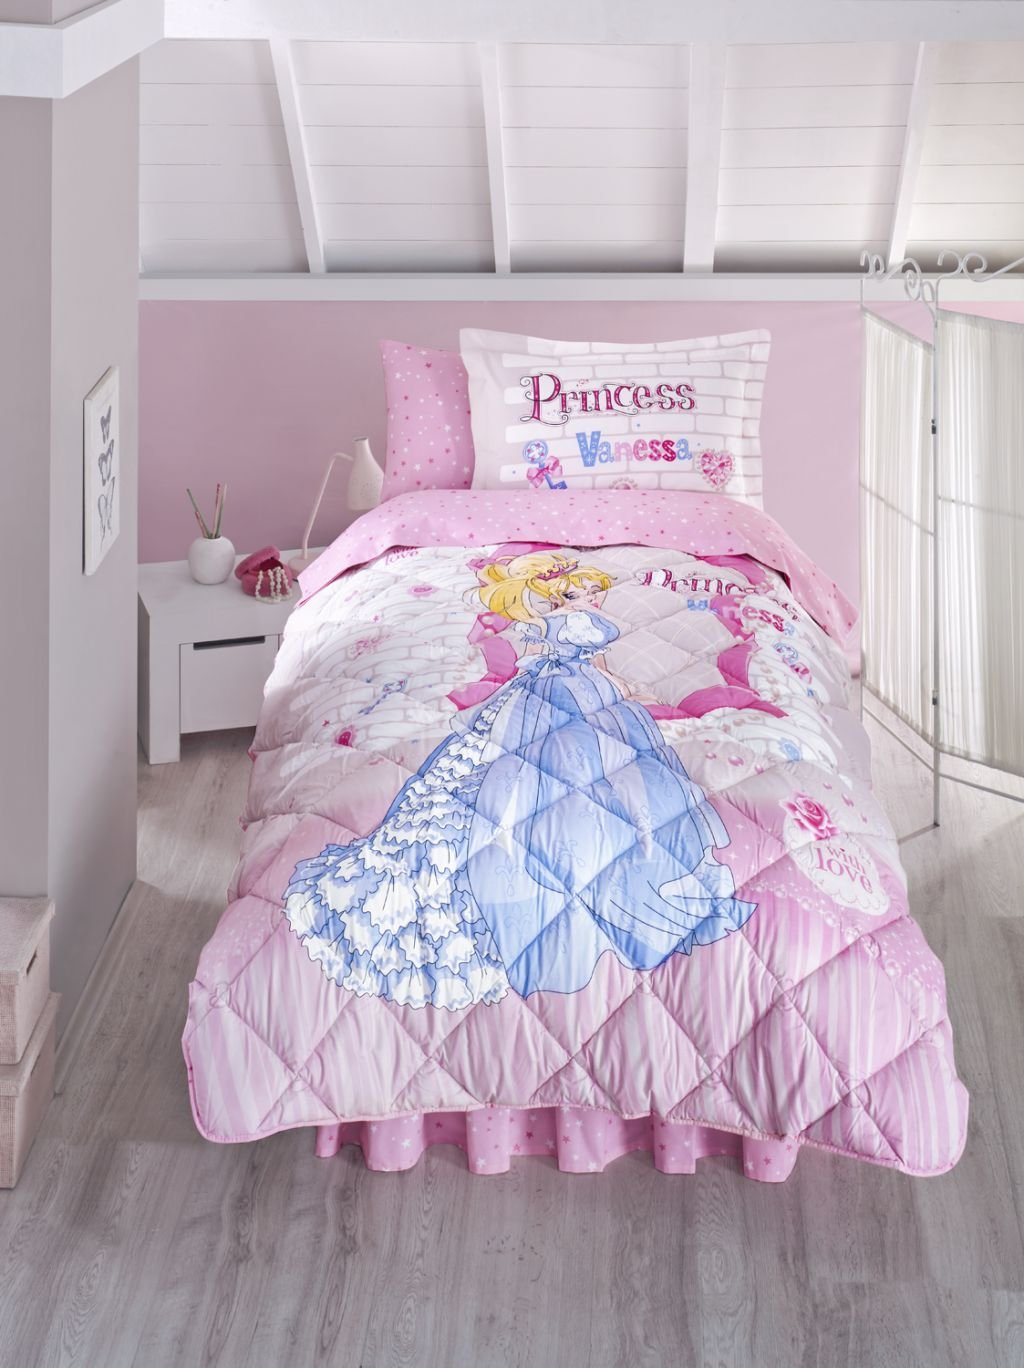 100%Cotton Princess Bedding Set,Girls Comforter Set, Single/Twin Size,Pink, 5 PCS